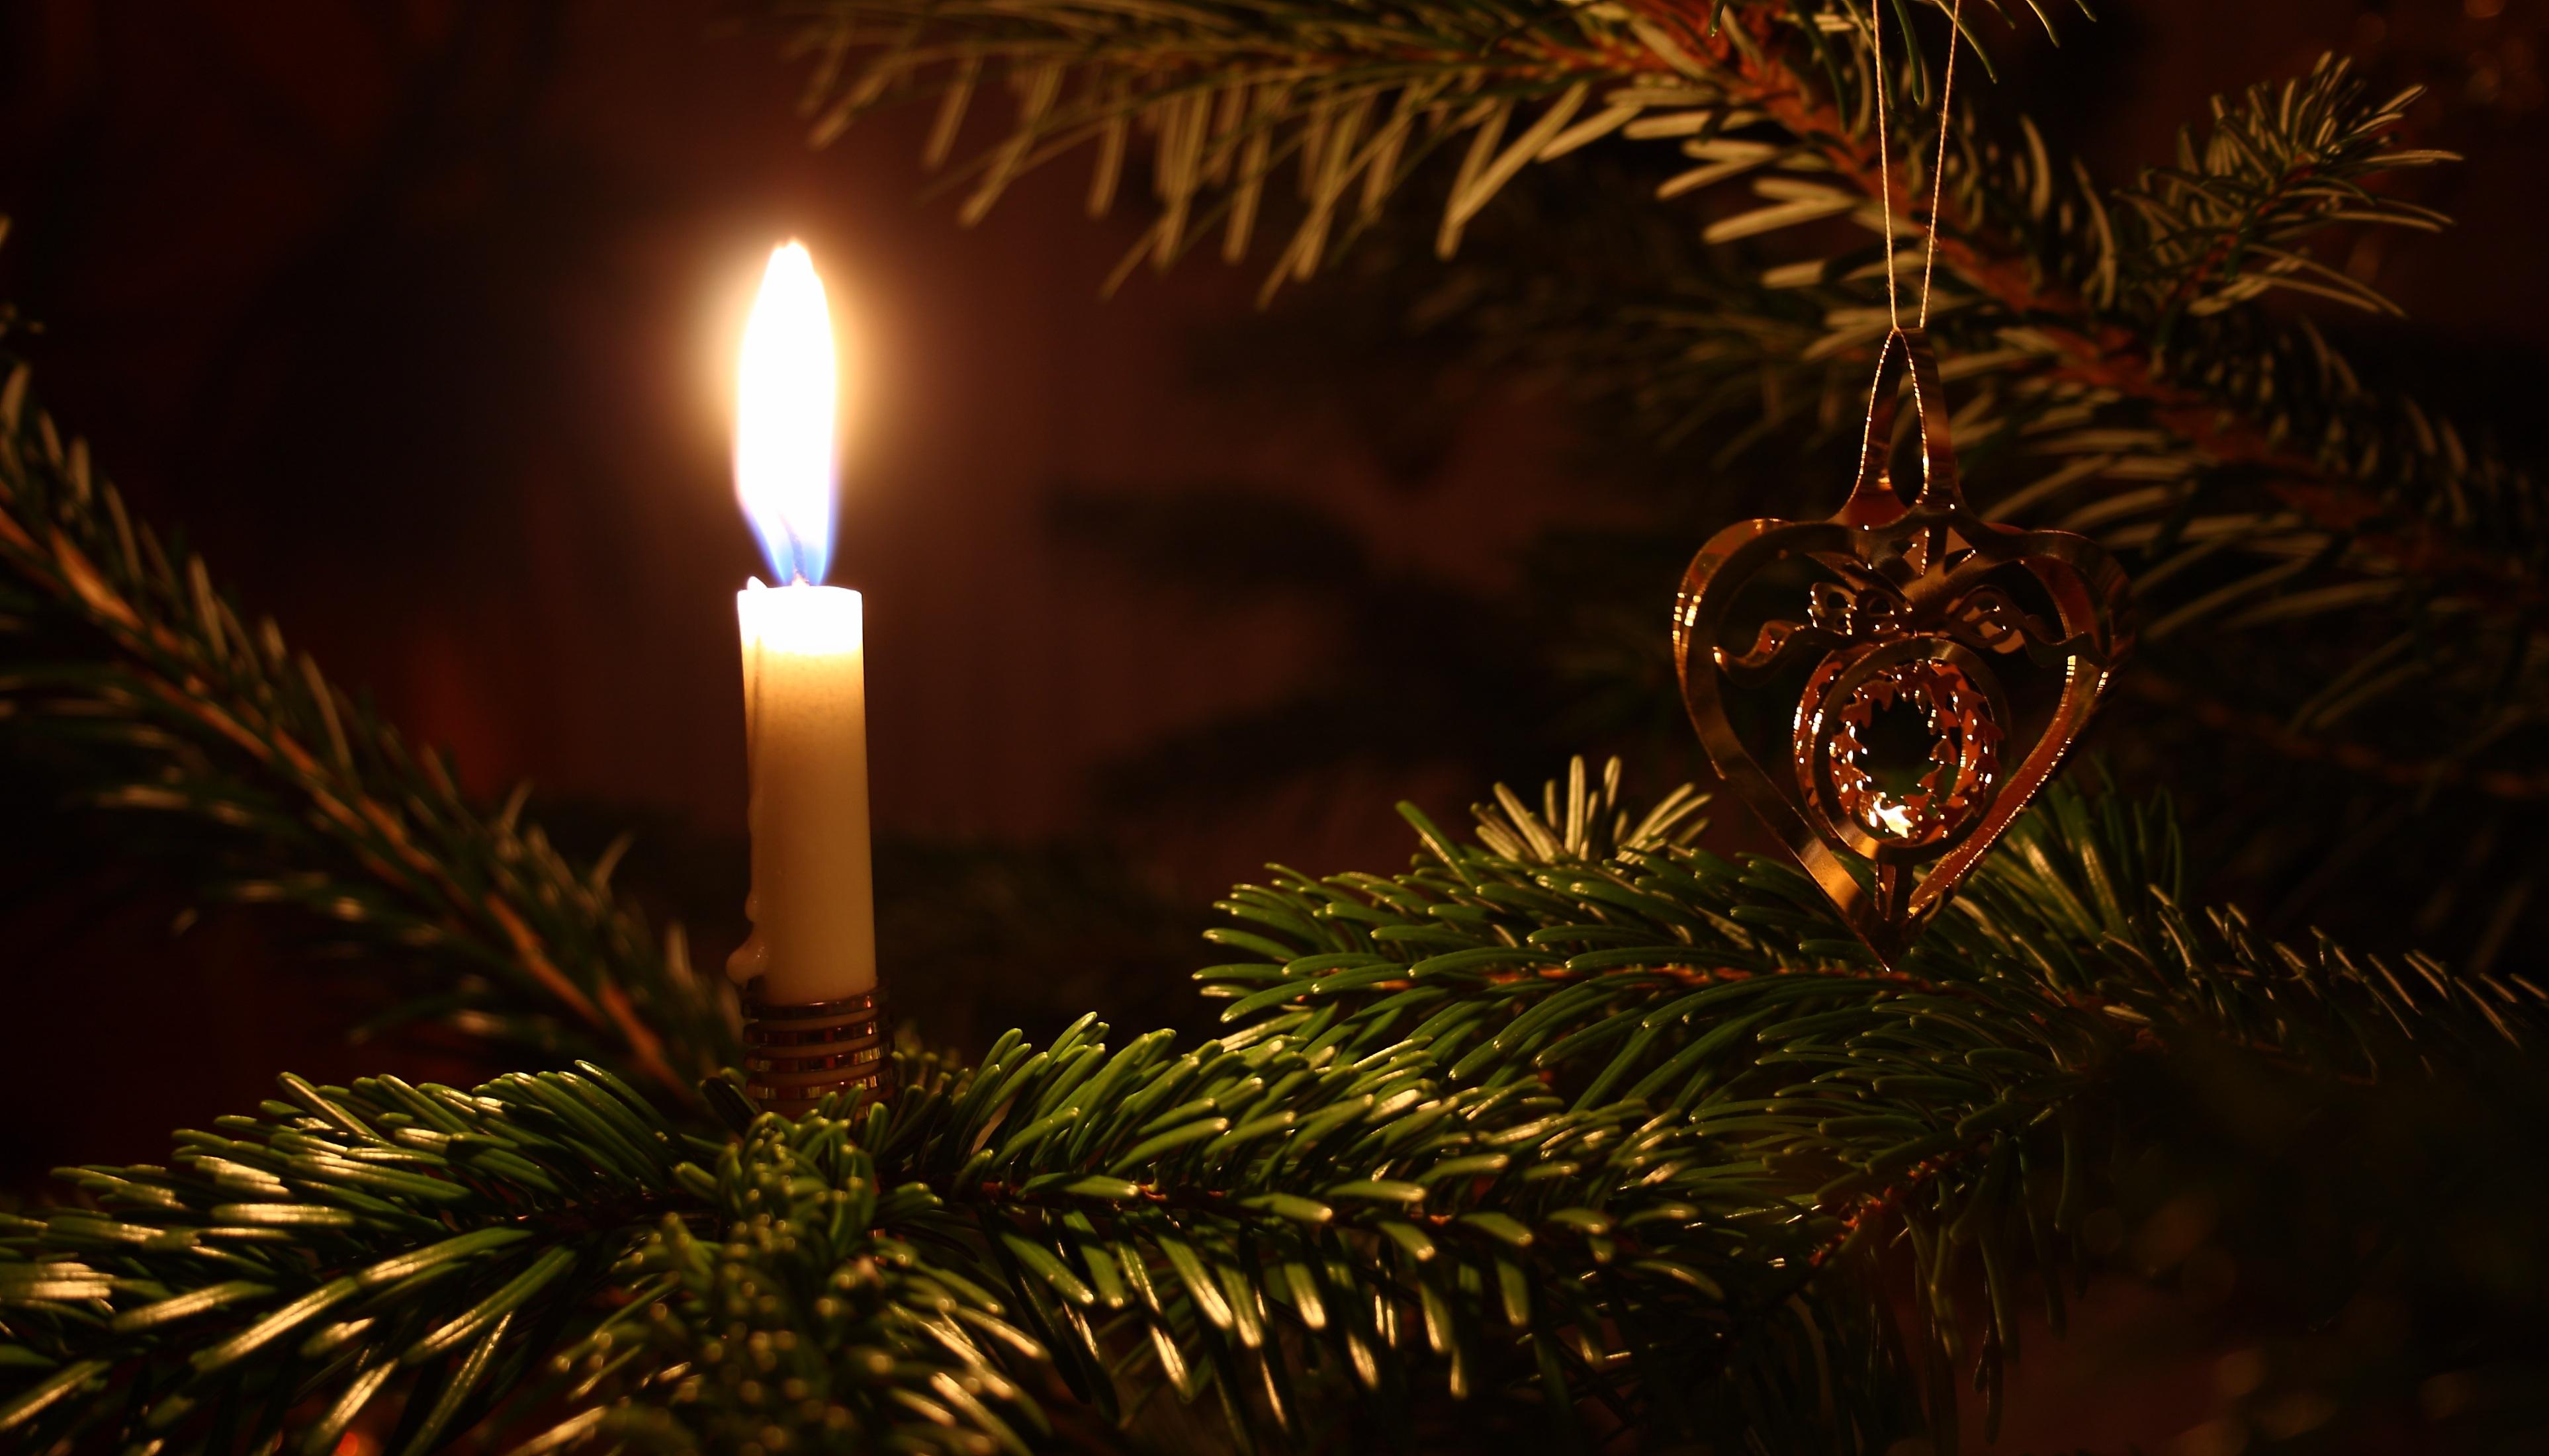 tree branch light night holiday darkness christmas fir lighting decor christmas tree christmas decoration event christmas